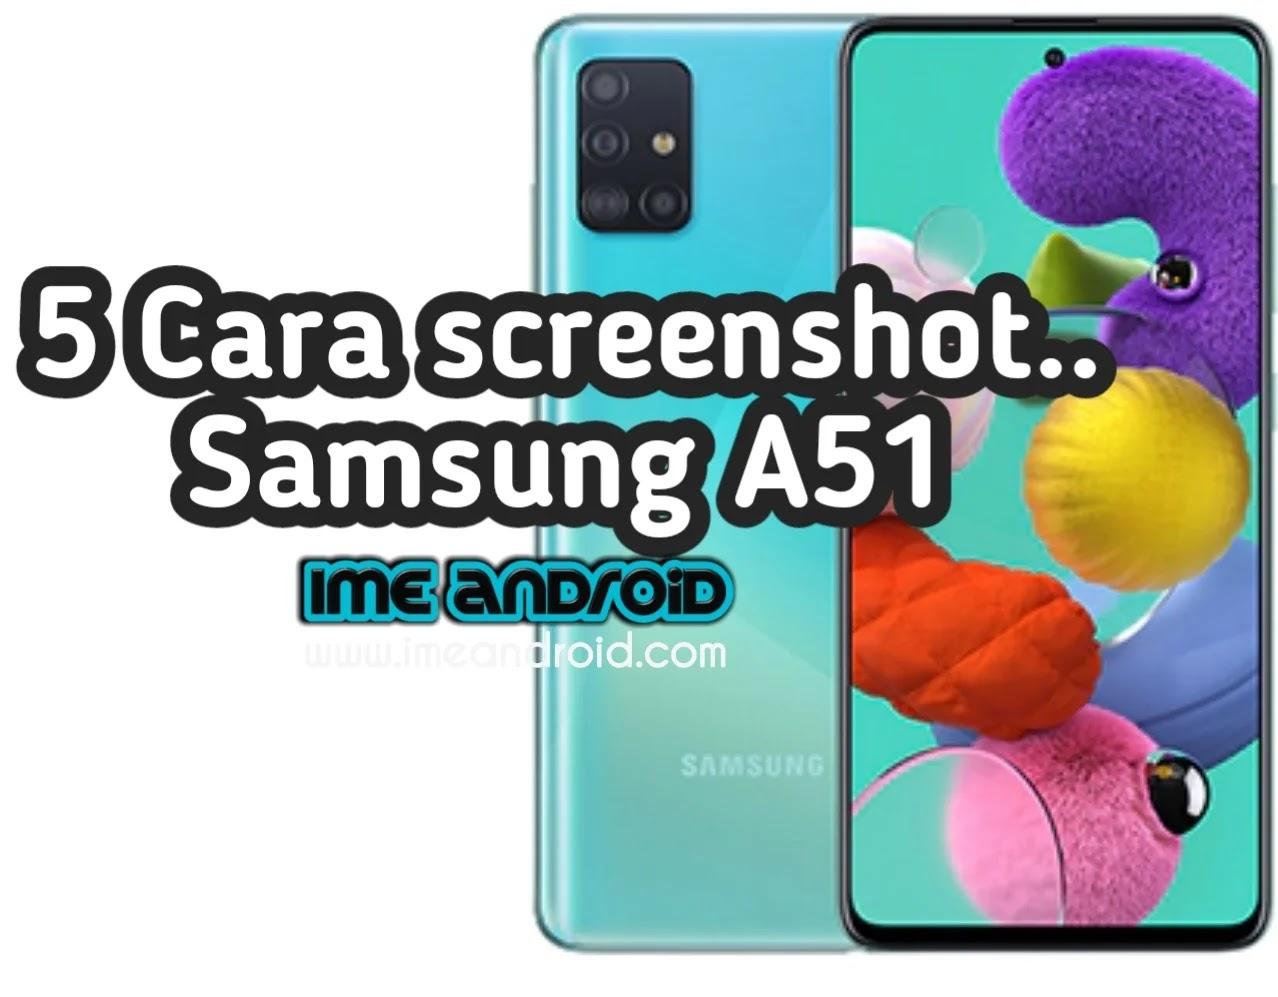 5 Begini Mudahnya Cara Screenshot Samsung A51 Ime Android